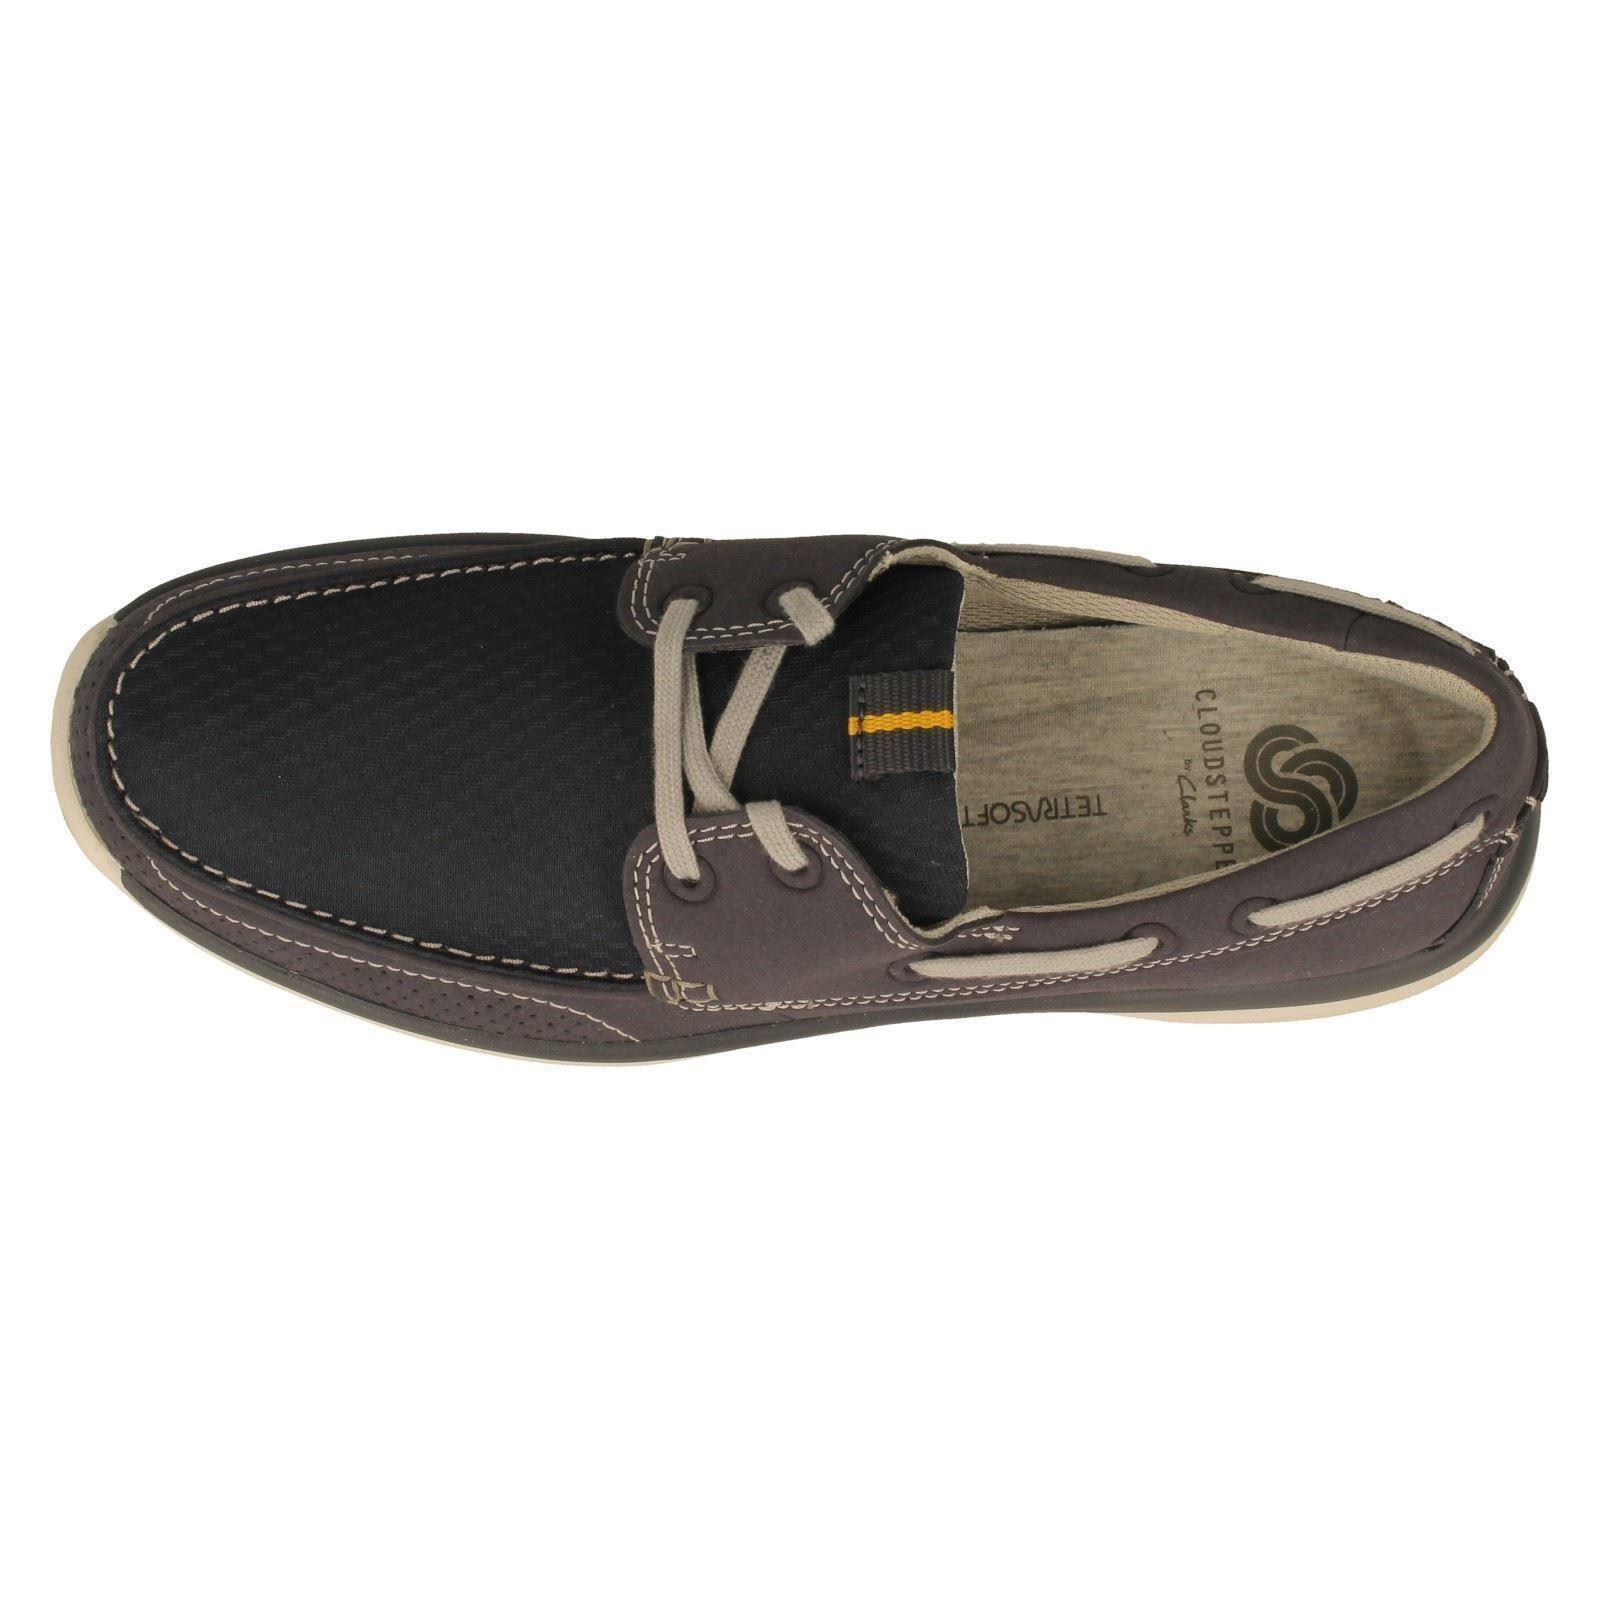 Clarks Scarpe Scarpe Scarpe Casual Stile Marcus Edge-W 4faf1c